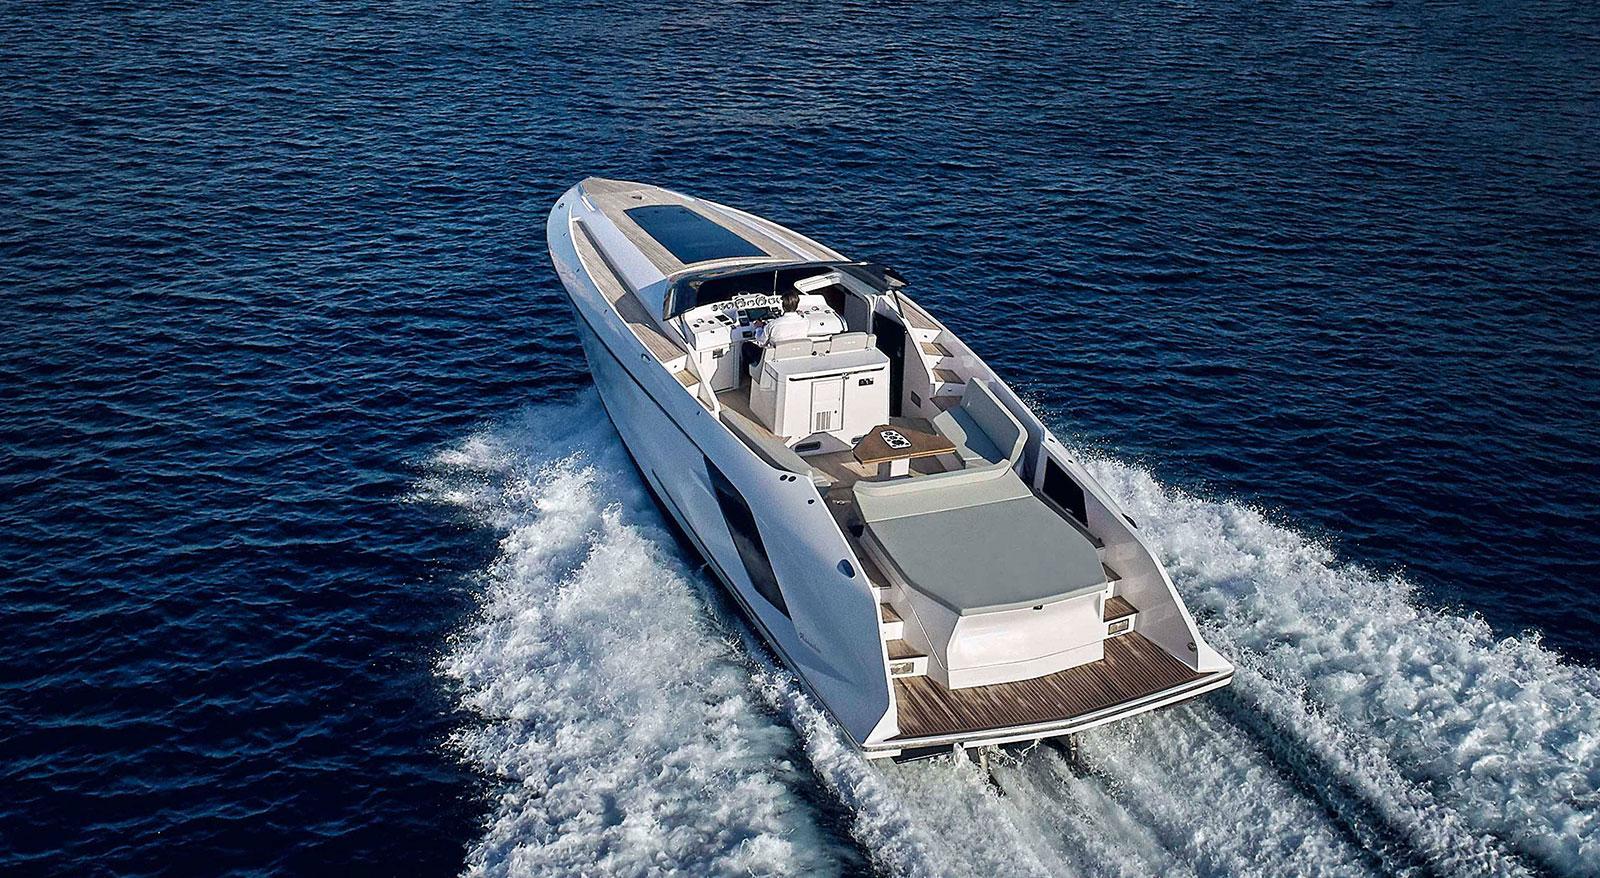 Motorboot-Charter-Mallorca-Motoryacht-Charter-Mallorca-5